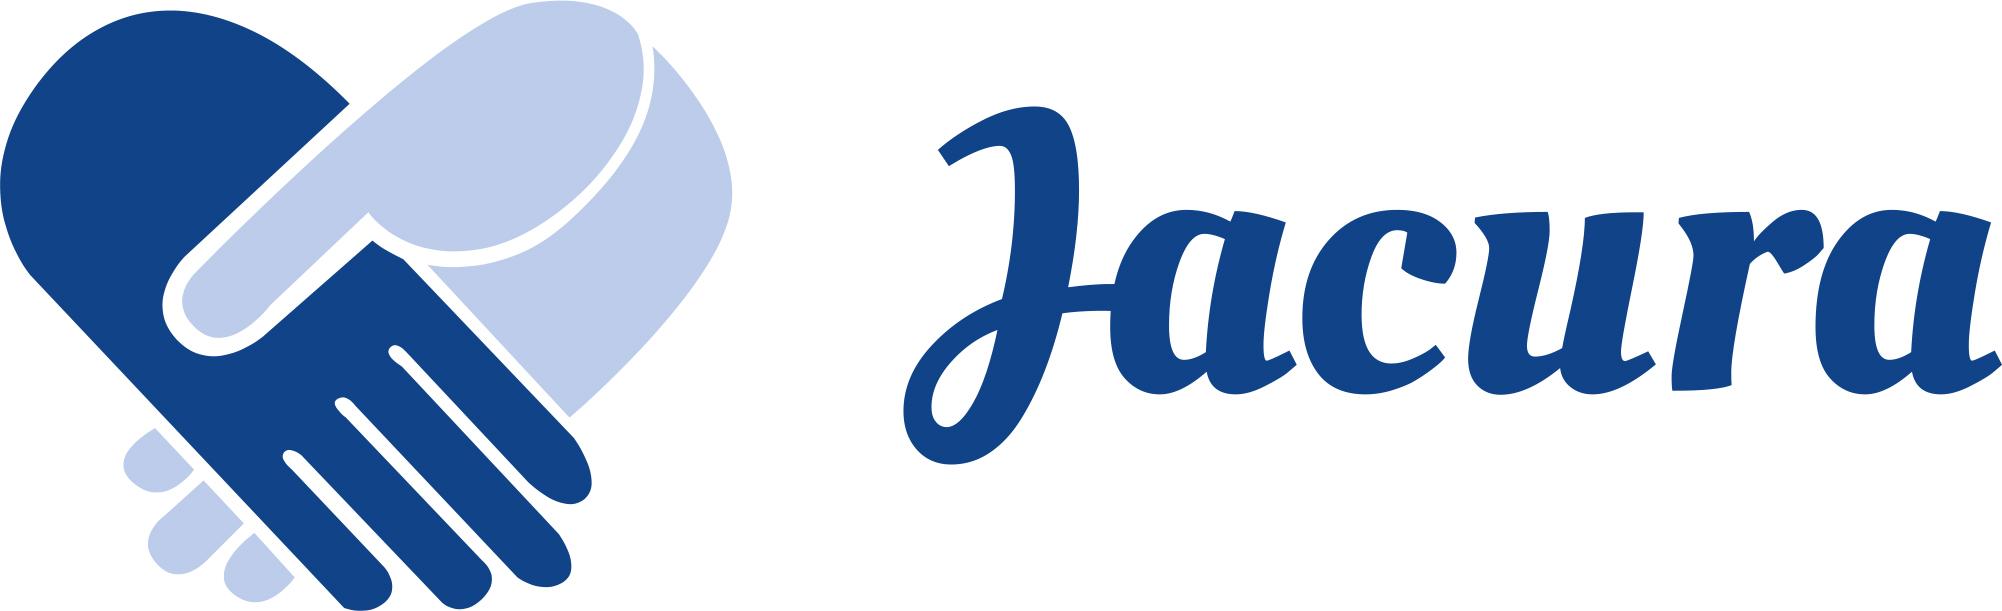 Logo Jacura 24h-Betreuung